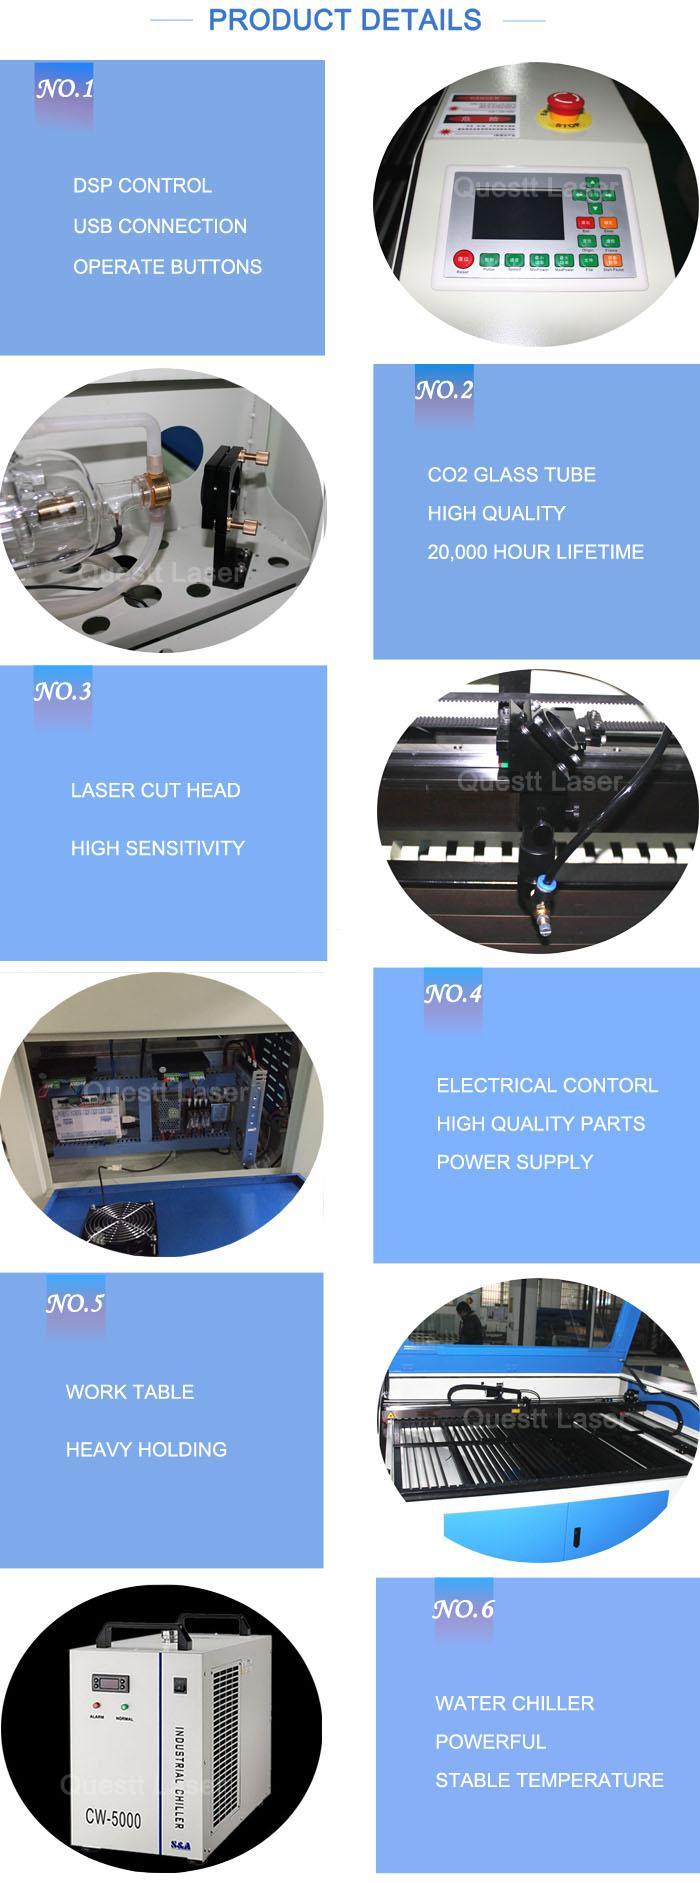 product-1300mmx900mm Universal laser engraving machine 150w co2 laser cutting machine laser printer